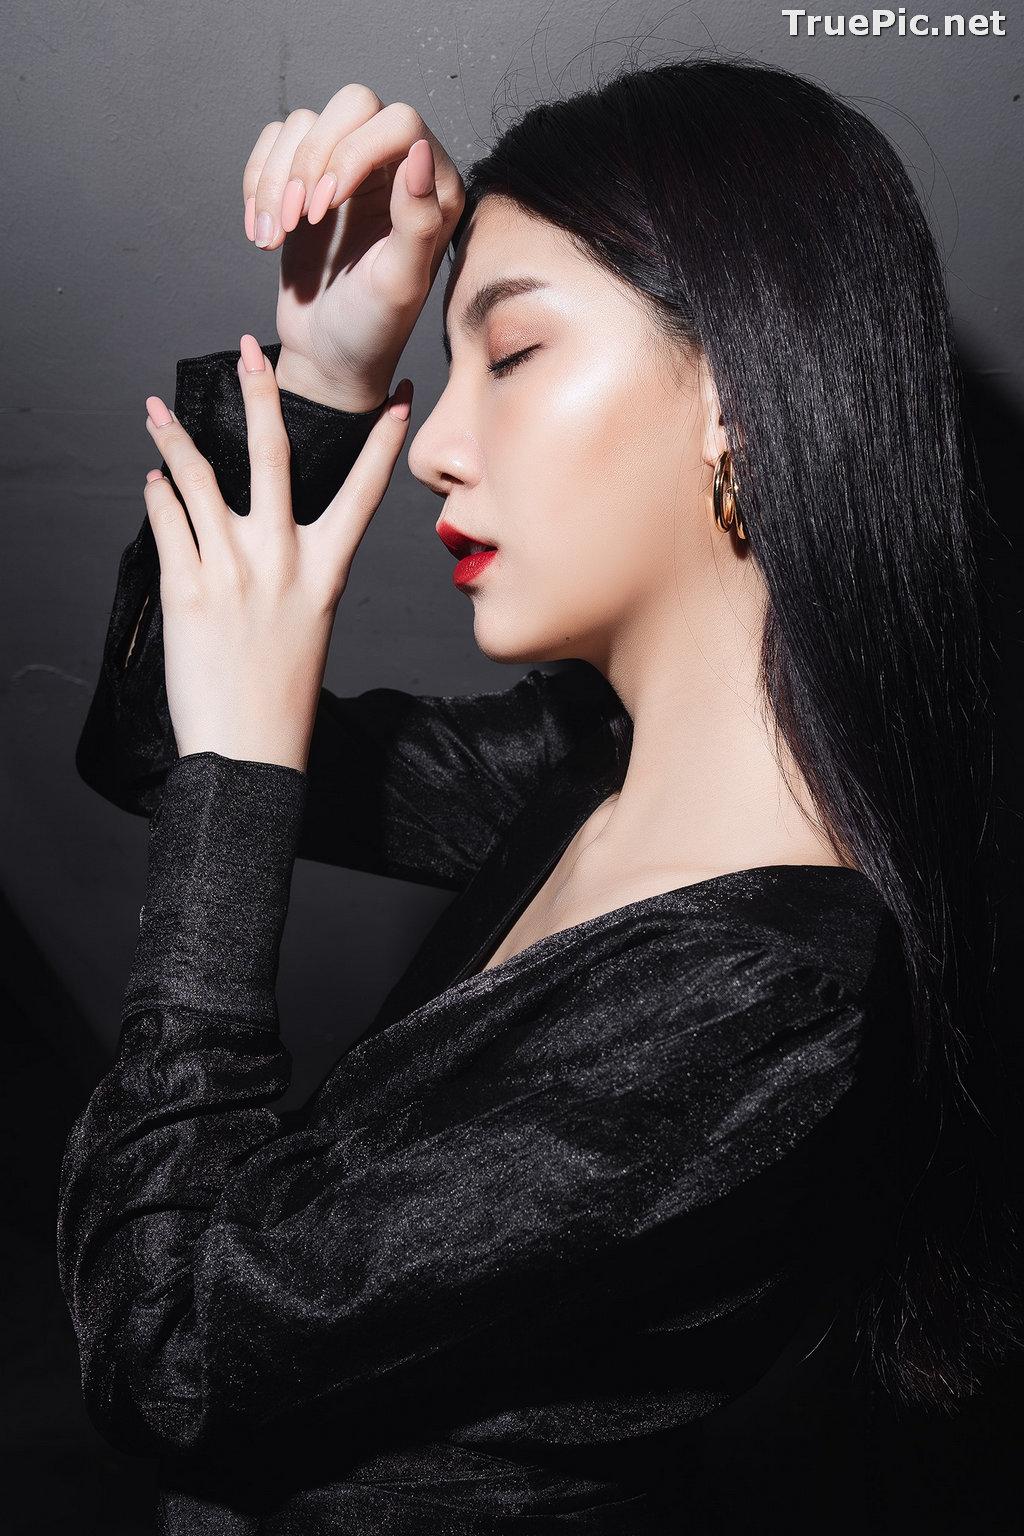 Image Thailand Model - Sasi Ngiunwan - Black For SiamNight - TruePic.net - Picture-14